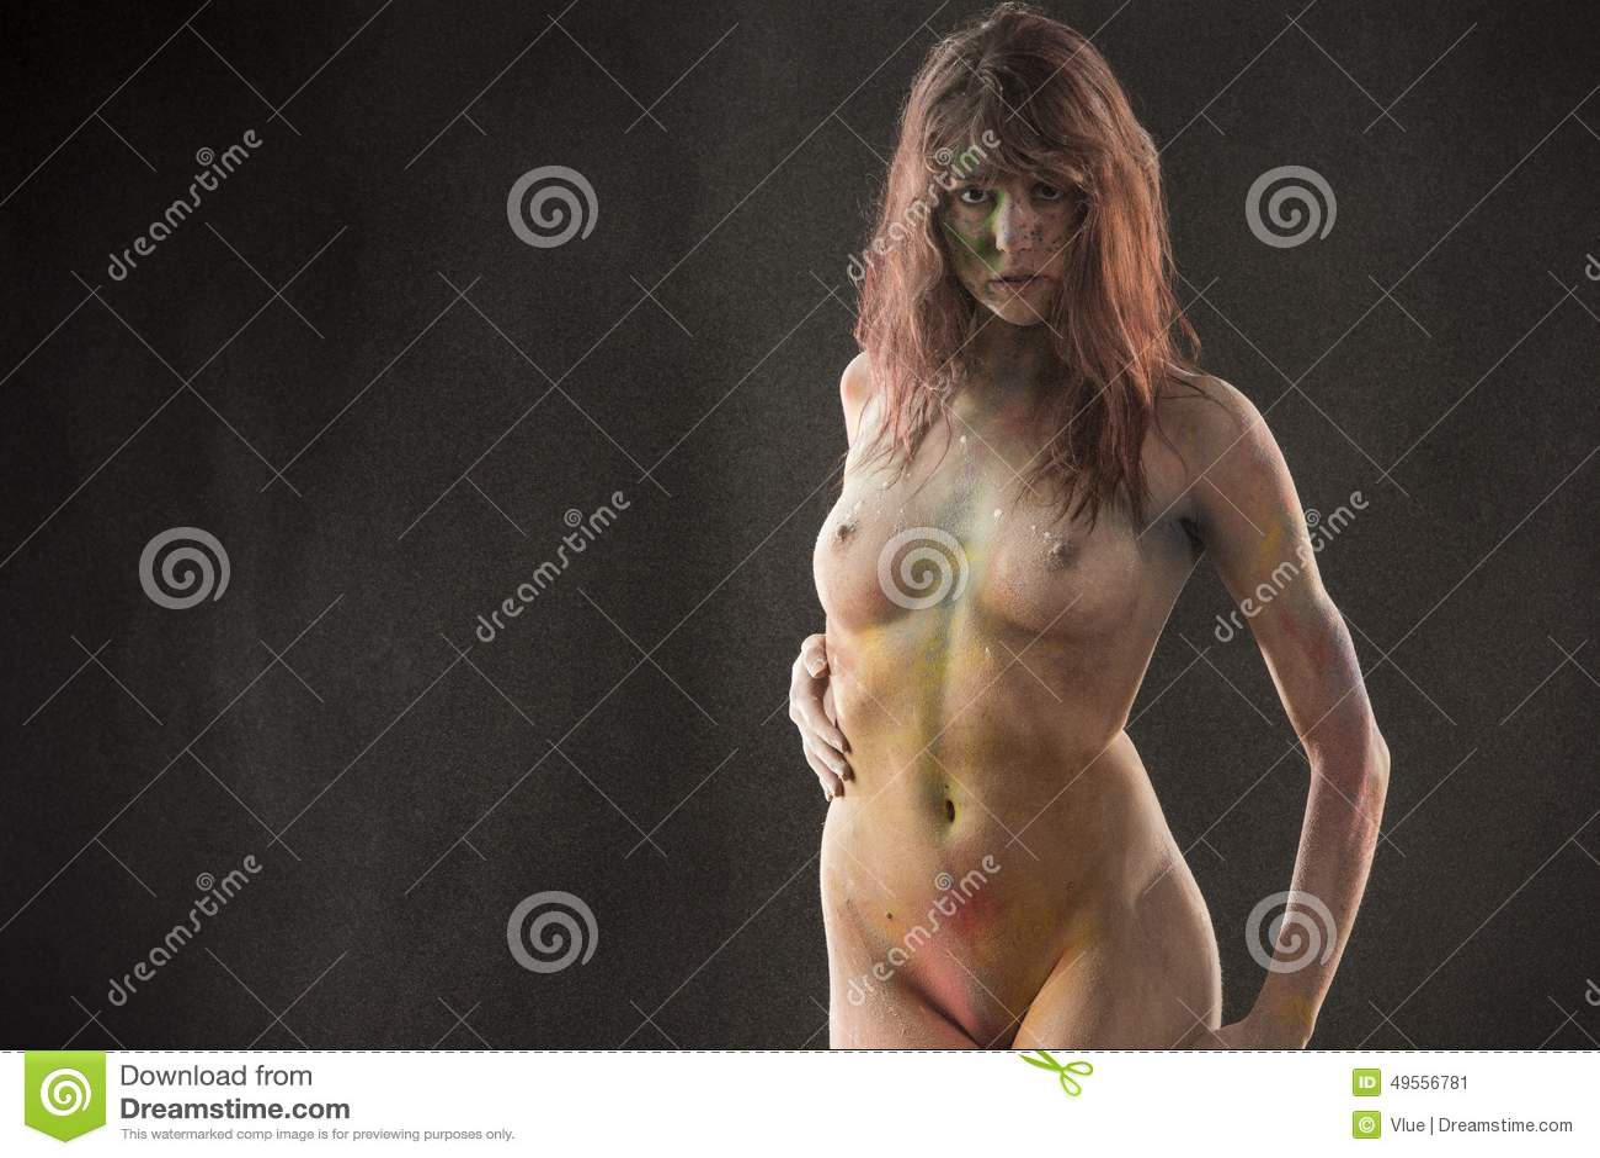 Seductive Naked Female With Body Paint Art Stock Image